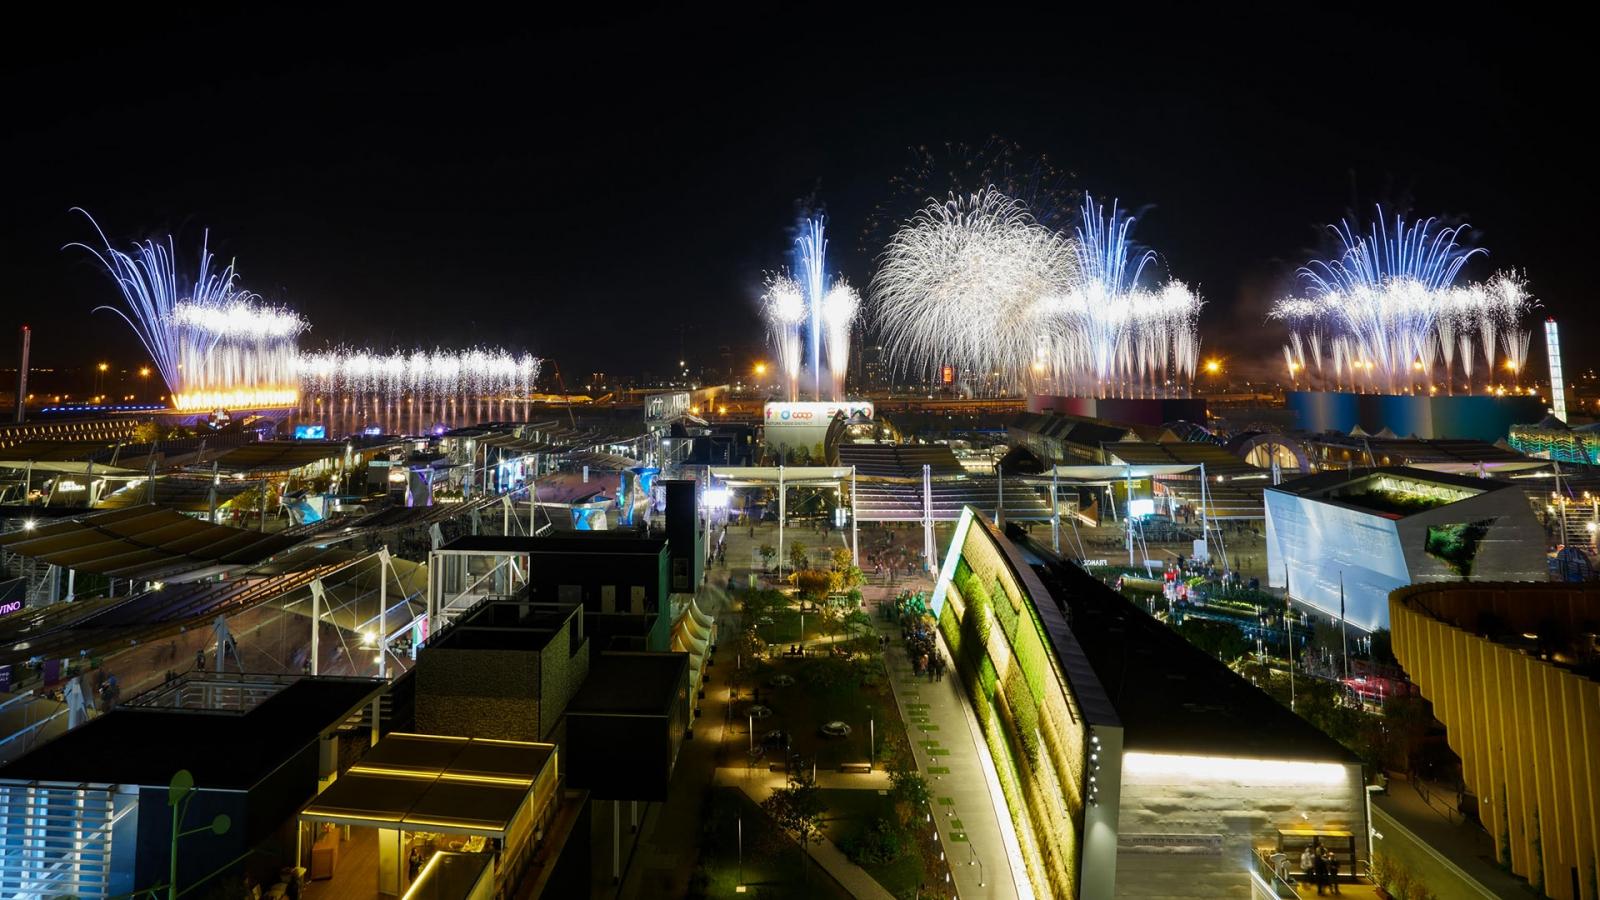 Expo 2015 Closing Ceremony